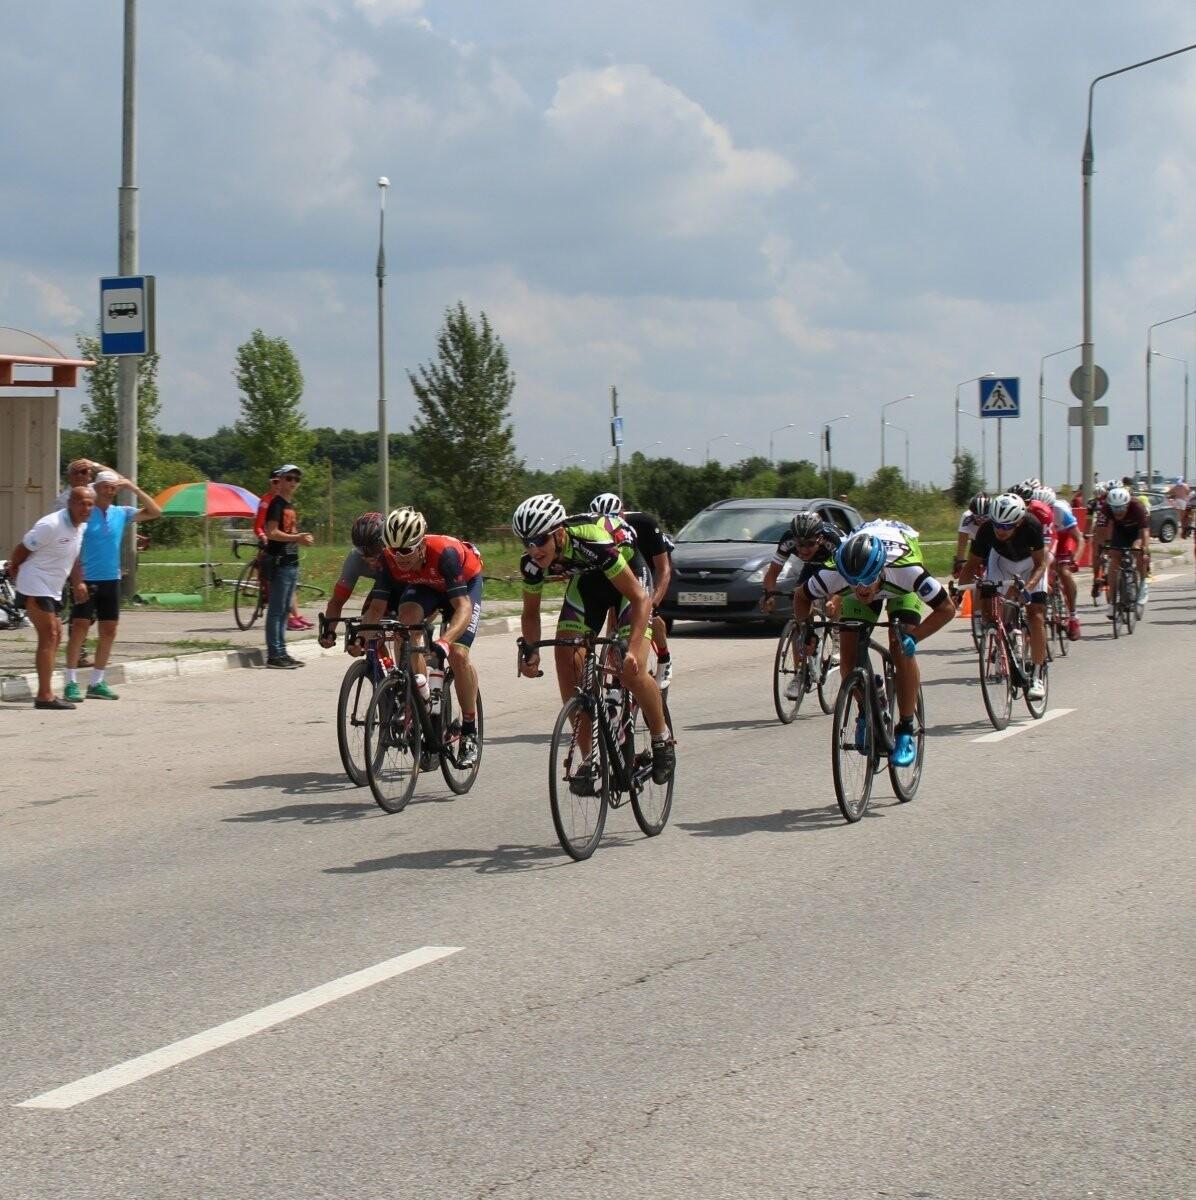 Тамбовчане стали лучшими на велогонках в Белгороде, фото-1